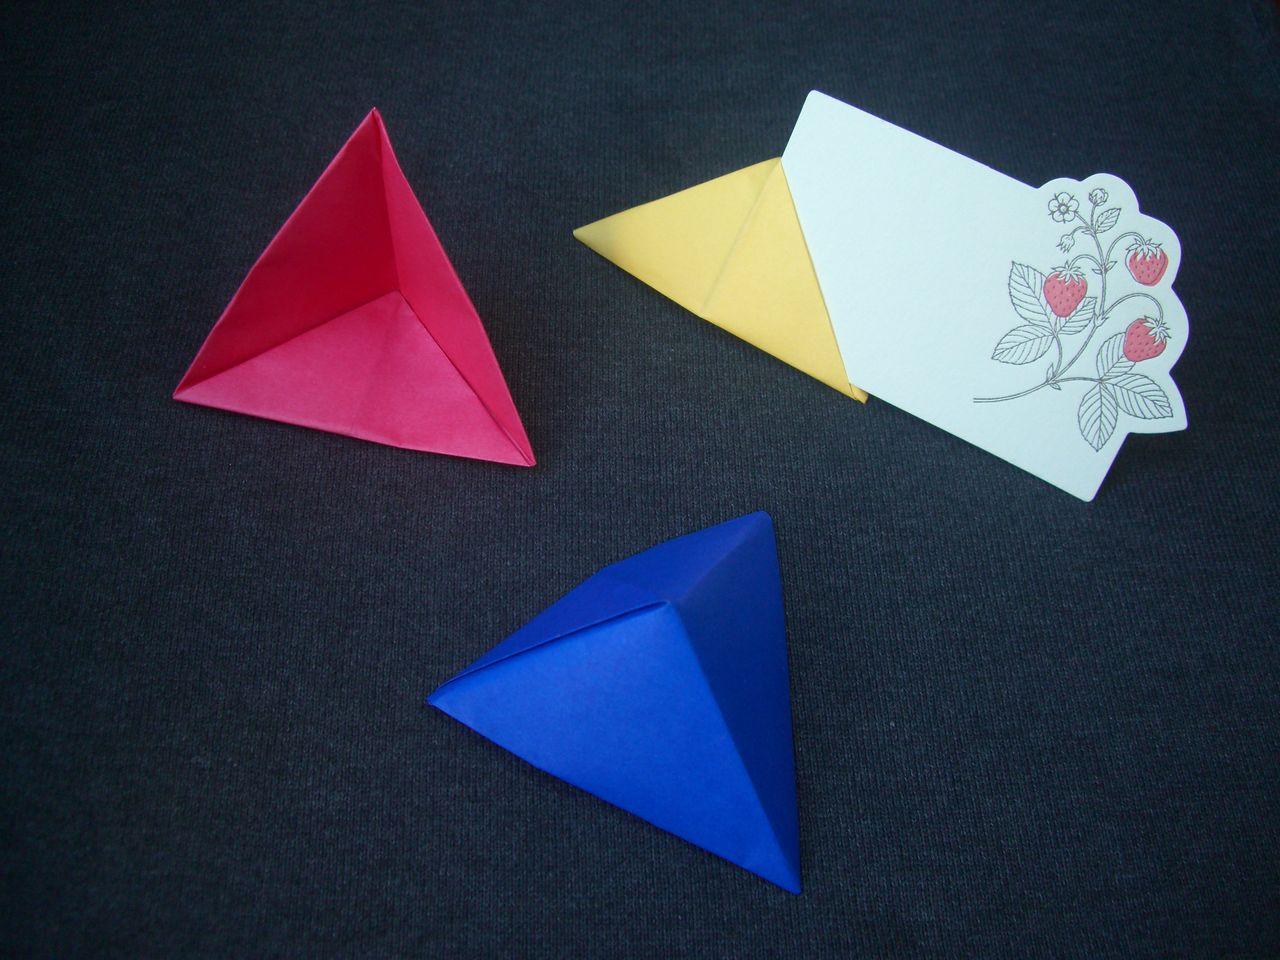 ebisuchachaのブログ : origami おり ... : 箸入れ 作り方 折り紙 : すべての折り紙